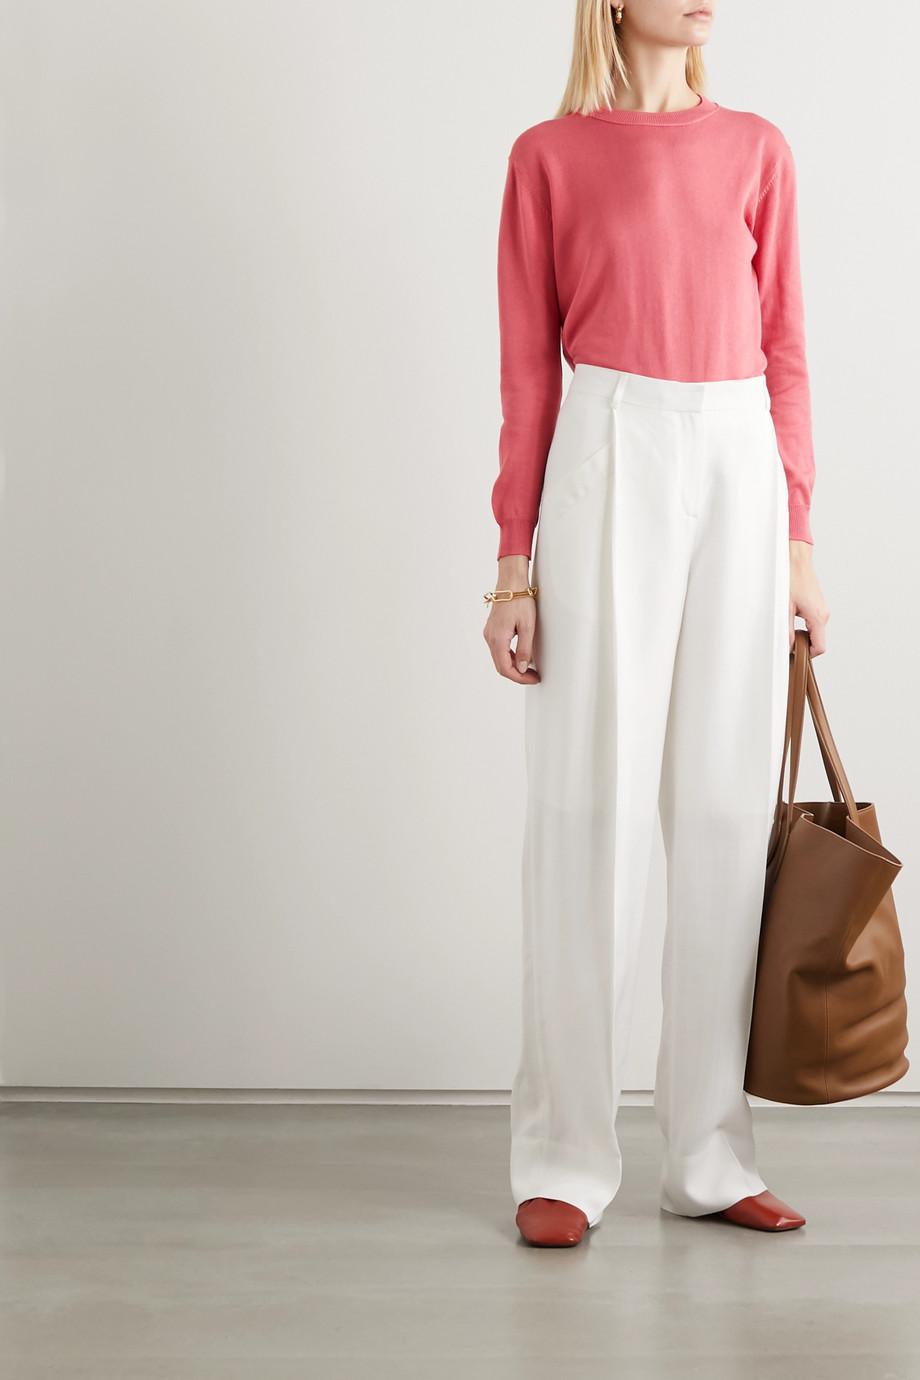 Alexandra Golovanoff Françoise cotton and silk-blend sweater